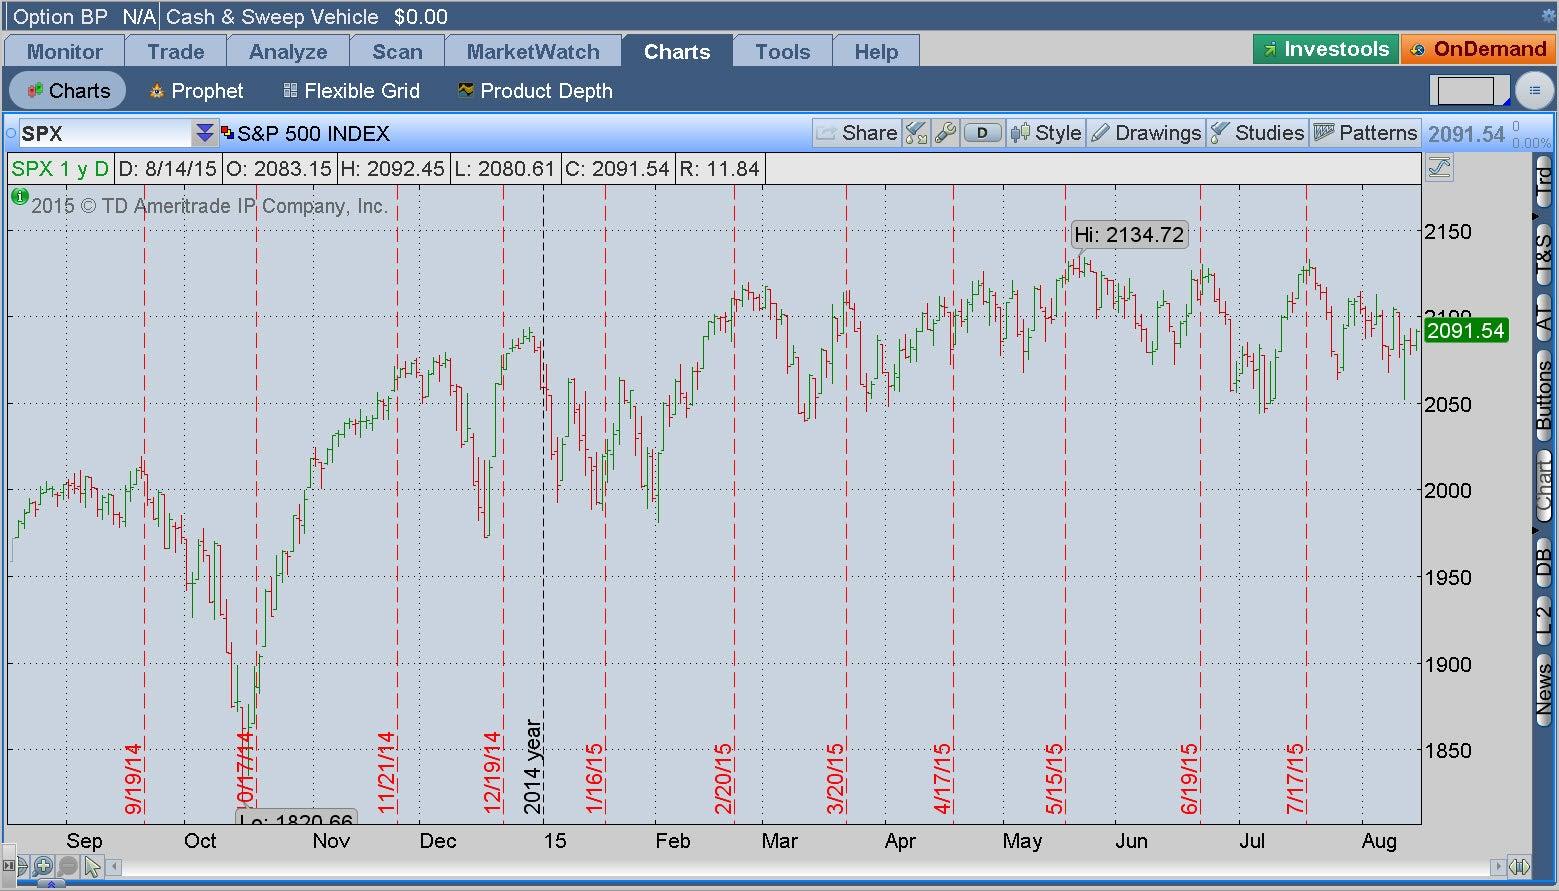 tt15_08_17_f1-stock-market-decline.jpg